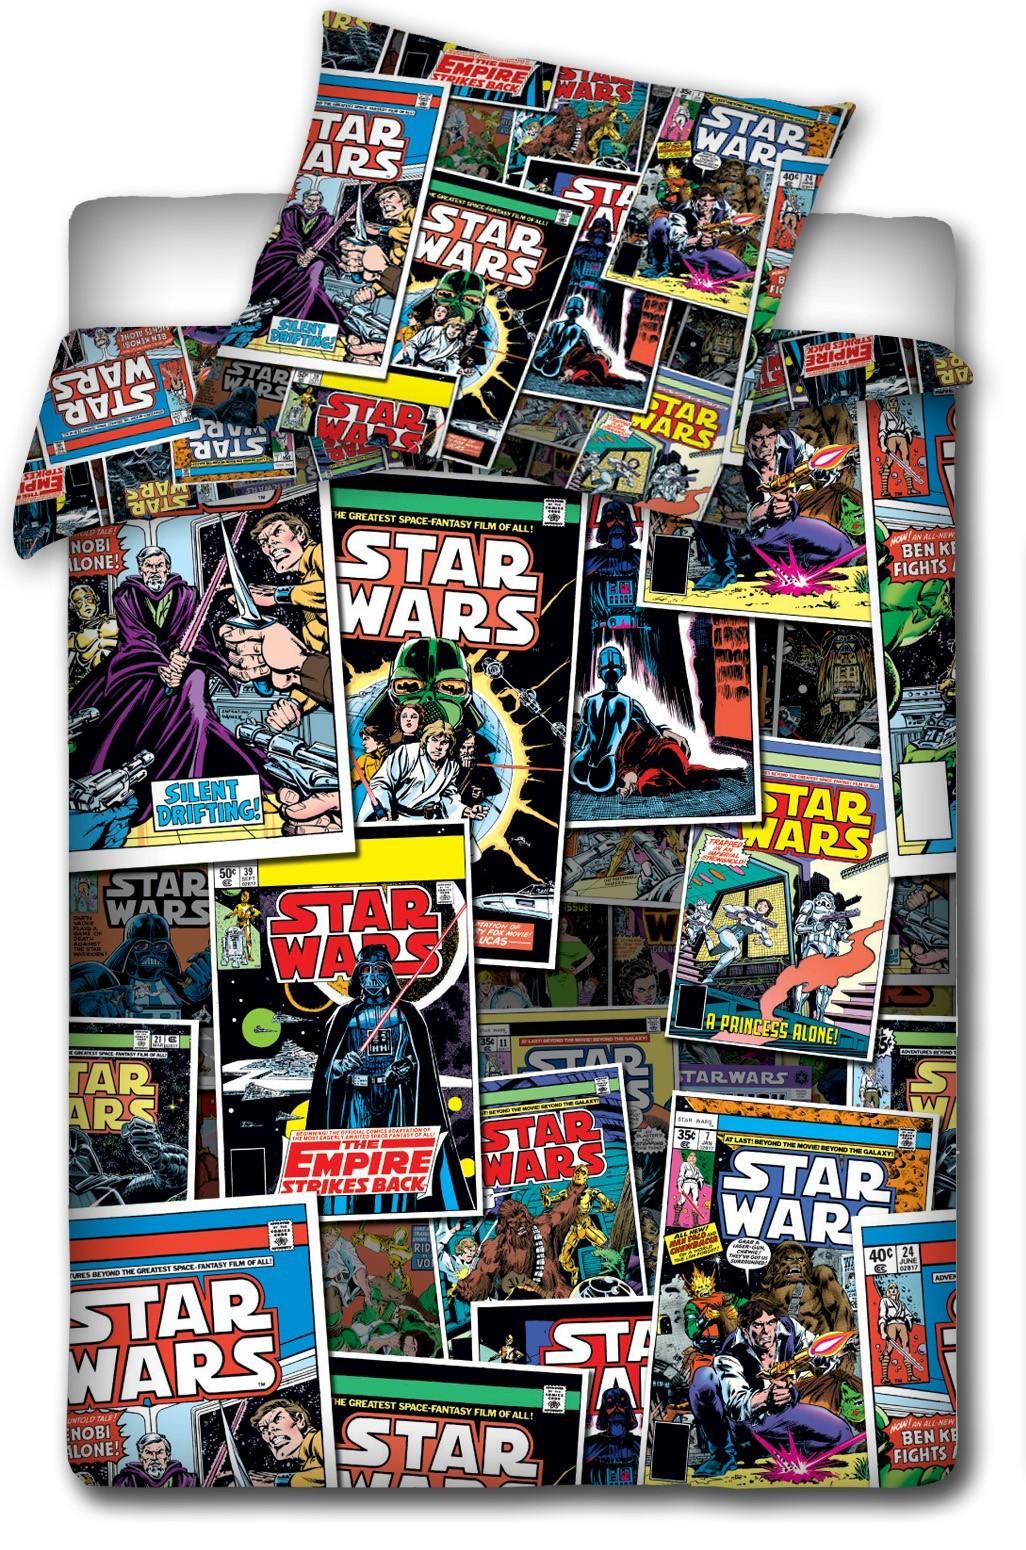 Funda Nordica Star Wars 90.Funda Nordica Star Wars Comic Cama 90 Original Single Duvet Set Minioutlet